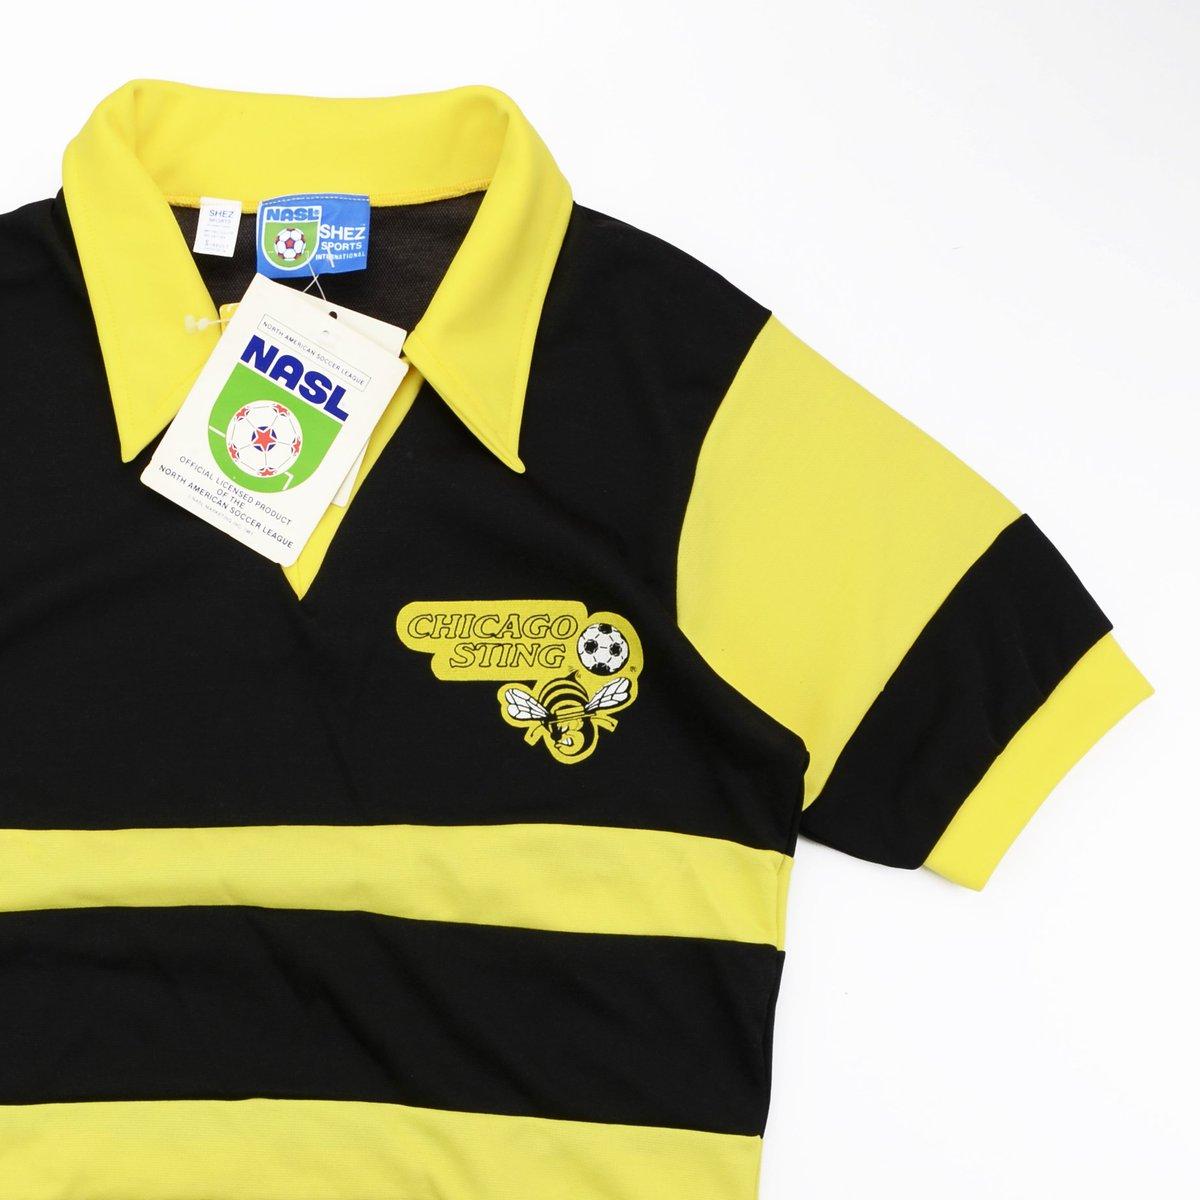 452de58222c Classic Football Shirts on Twitter